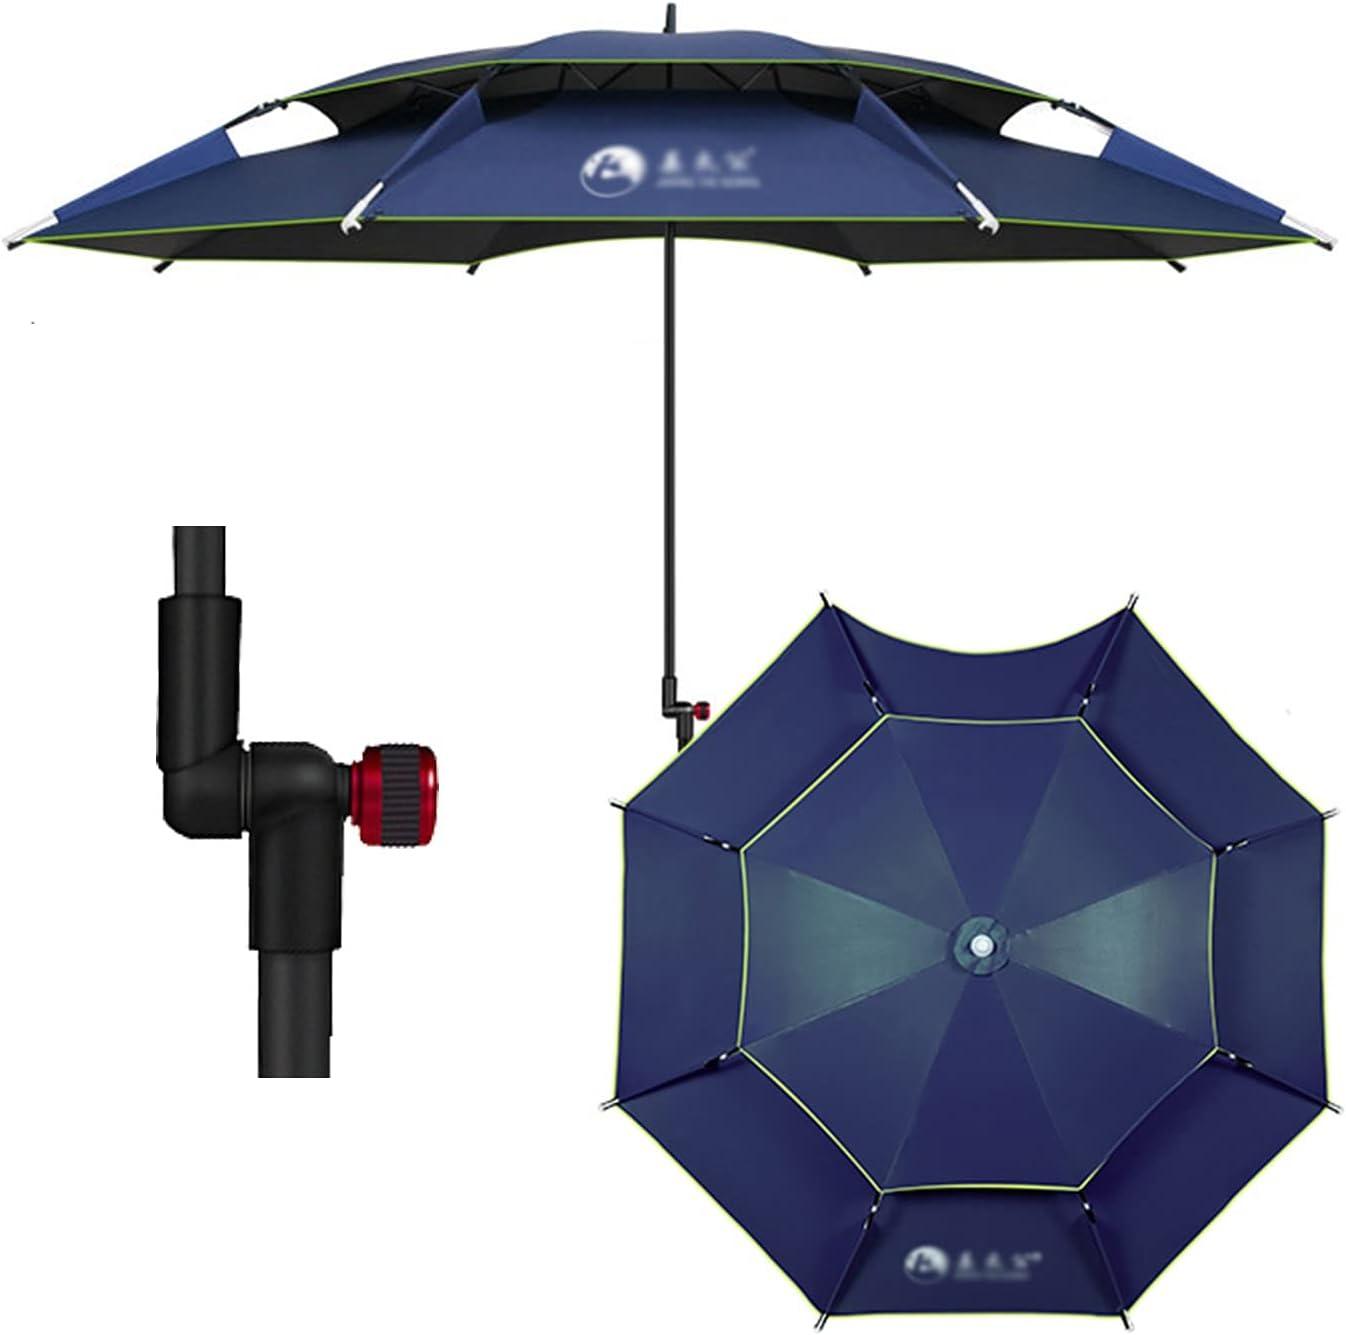 ZAZAP-1 Navy Max 75% OFF Blue Fishing Umbrella Parasol safety Garden Round Umbrell